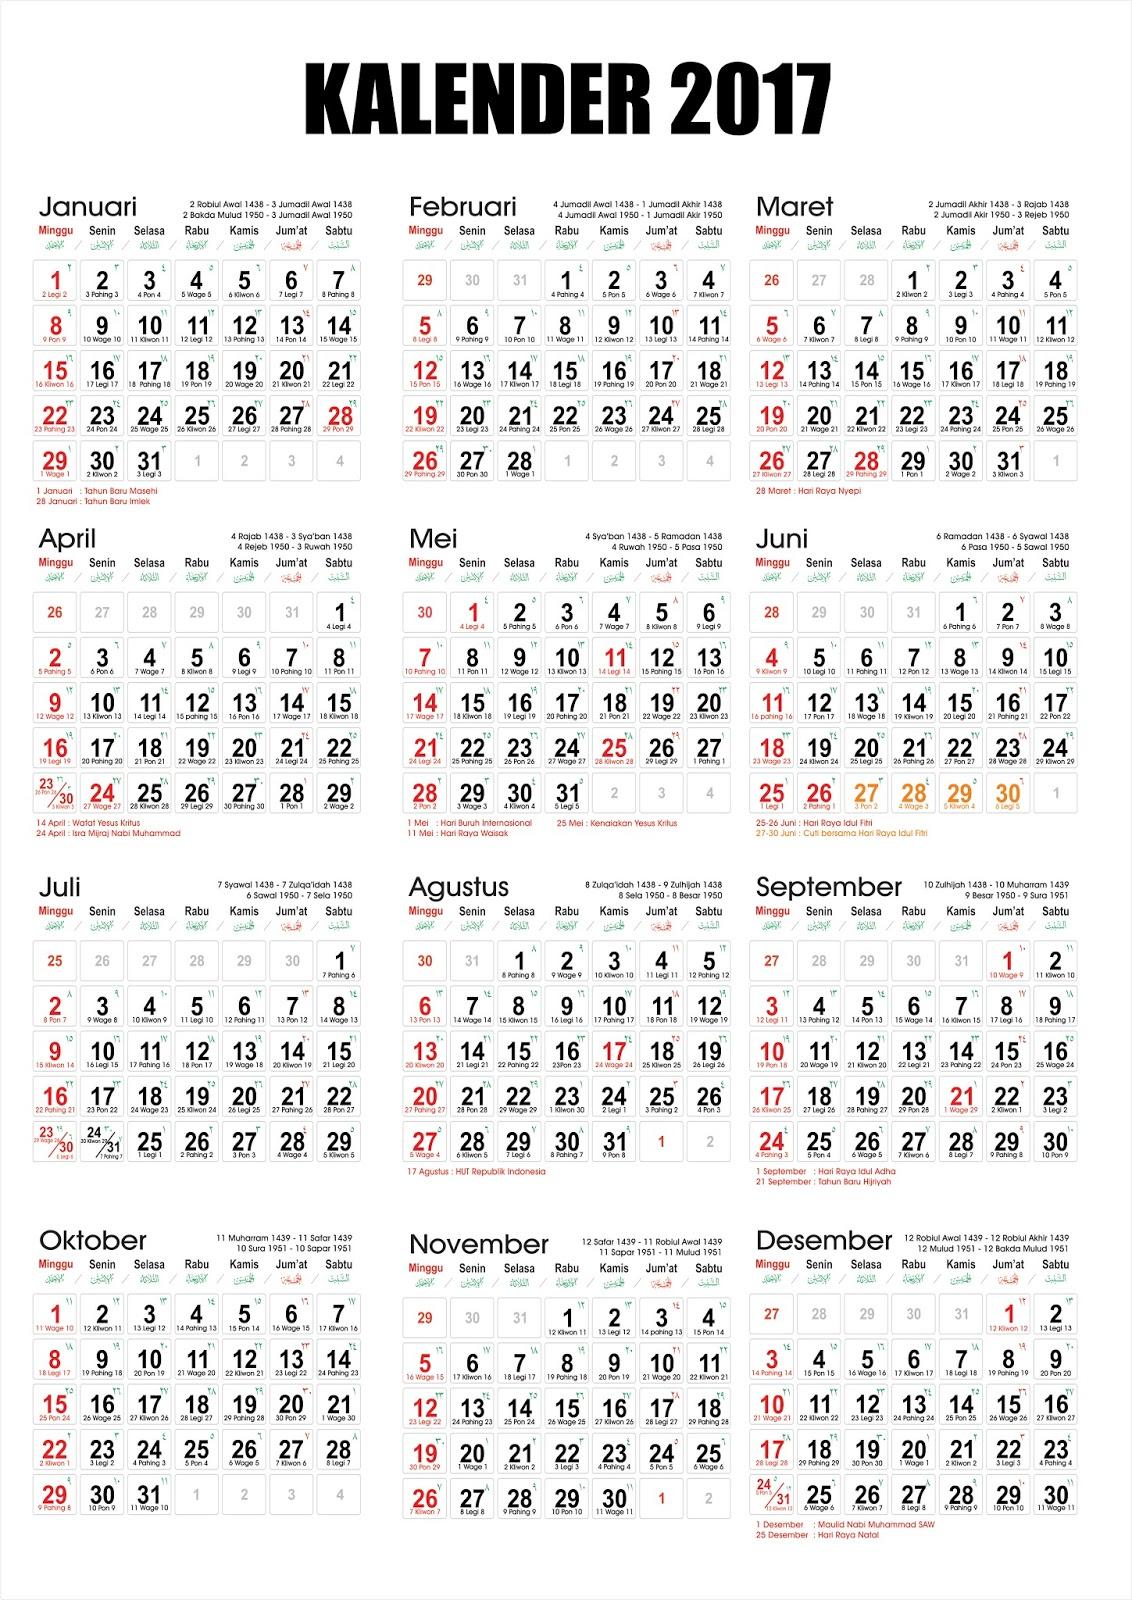 Kalender Nasional 2017 : kalender, nasional, Desember, Kalender